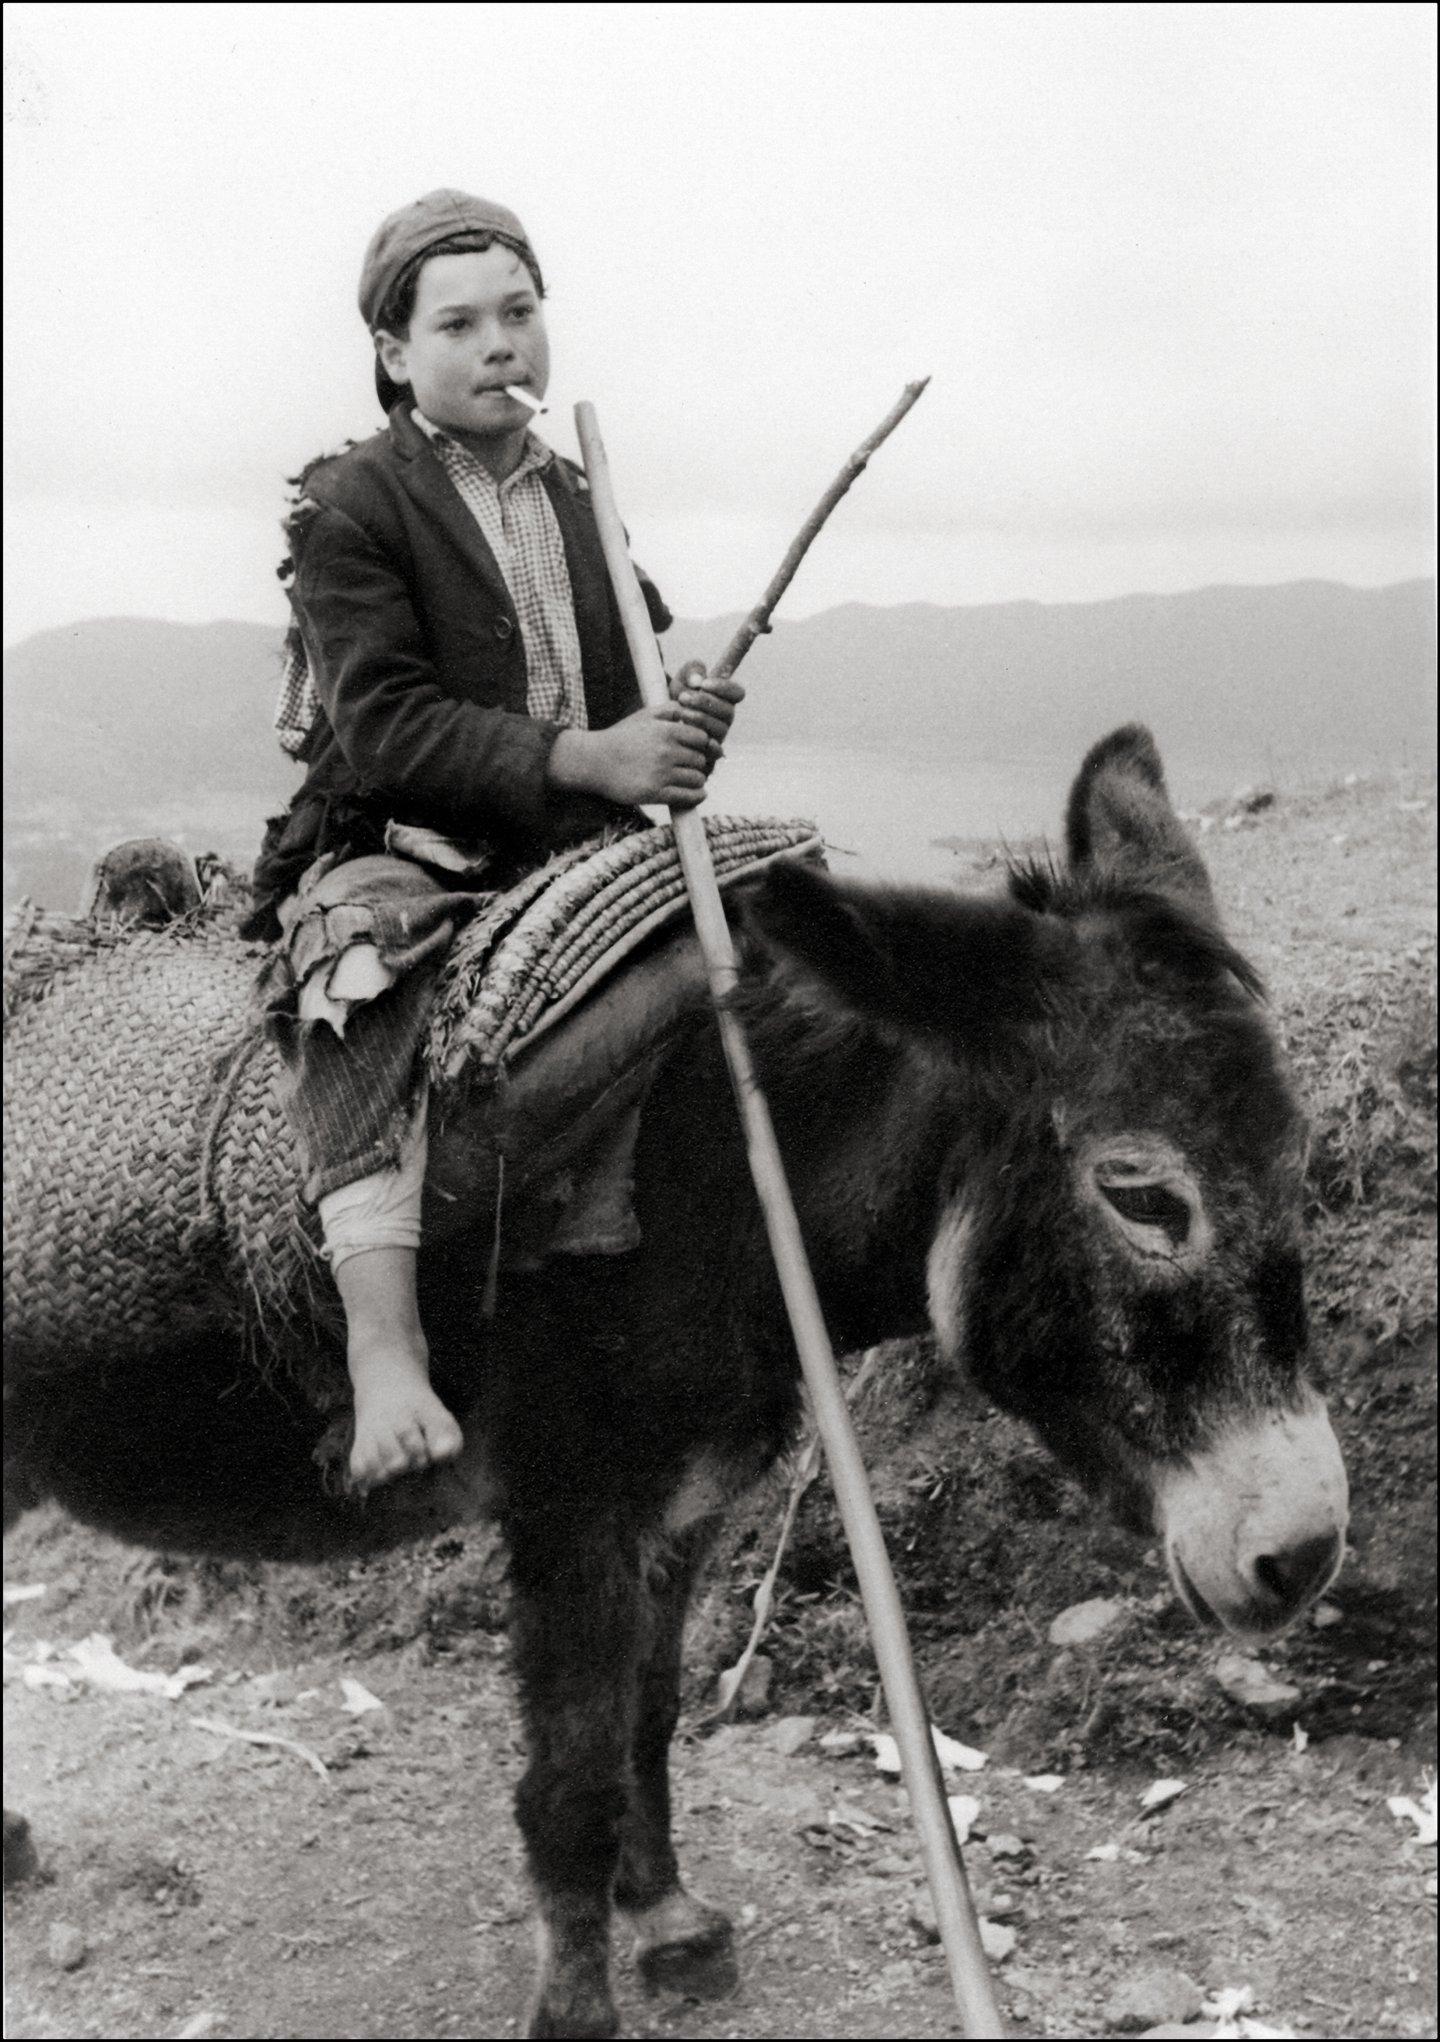 Smoking On His Donkey